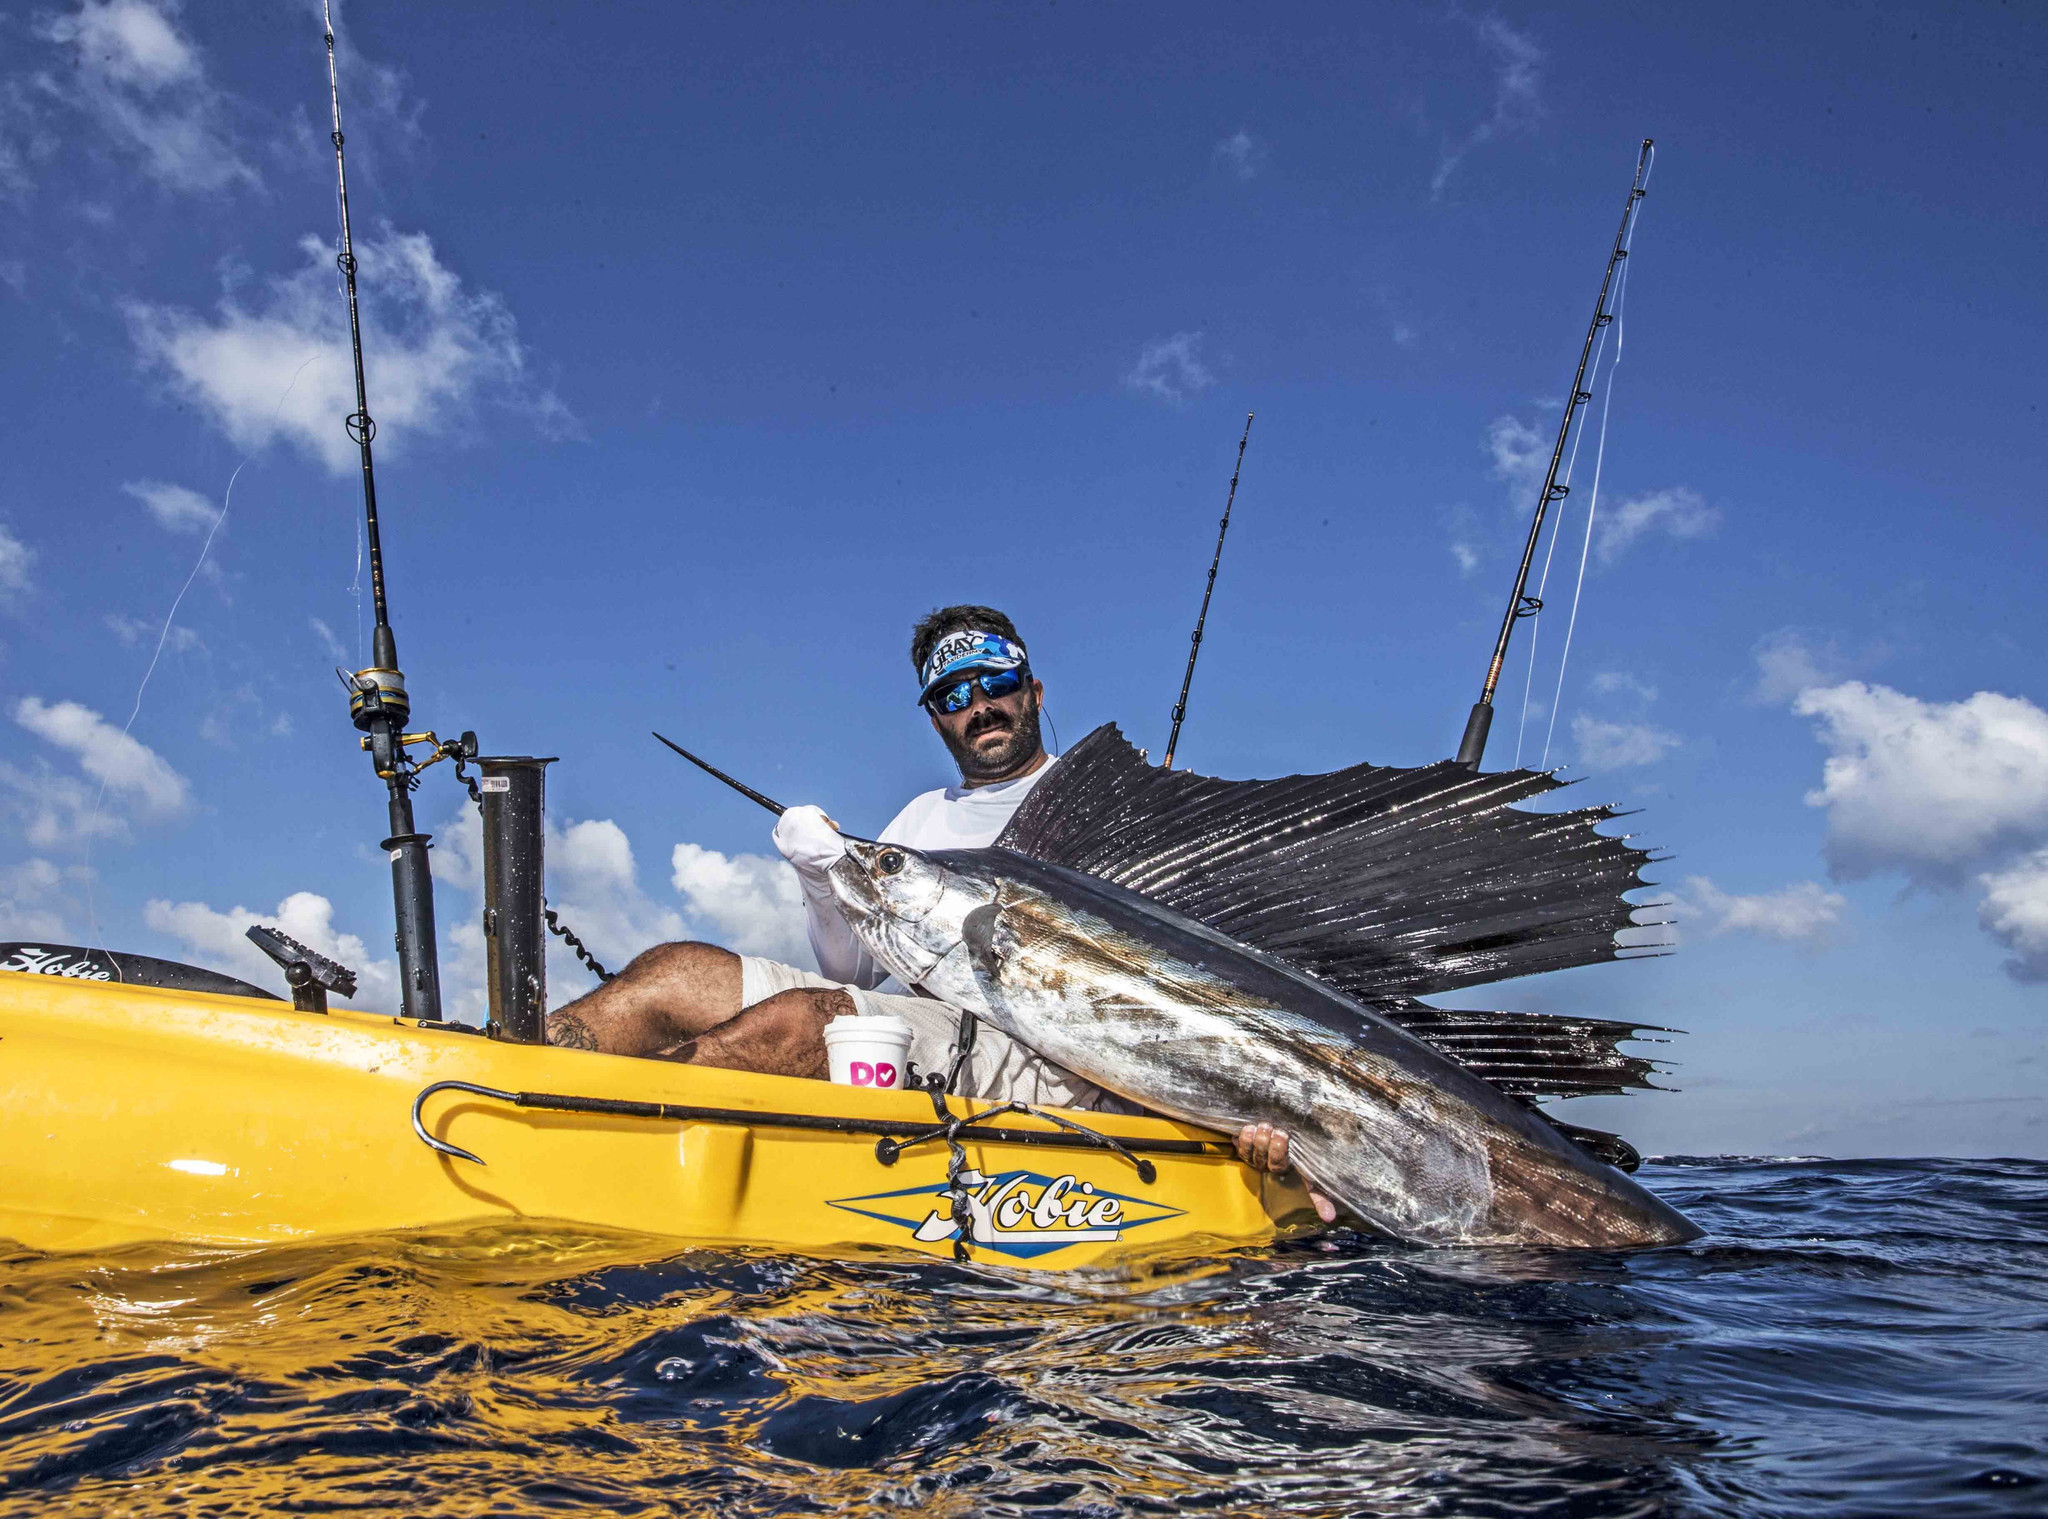 Benny scoca catches a record four sailfish to win kayak for Kayak fishing tournaments near me